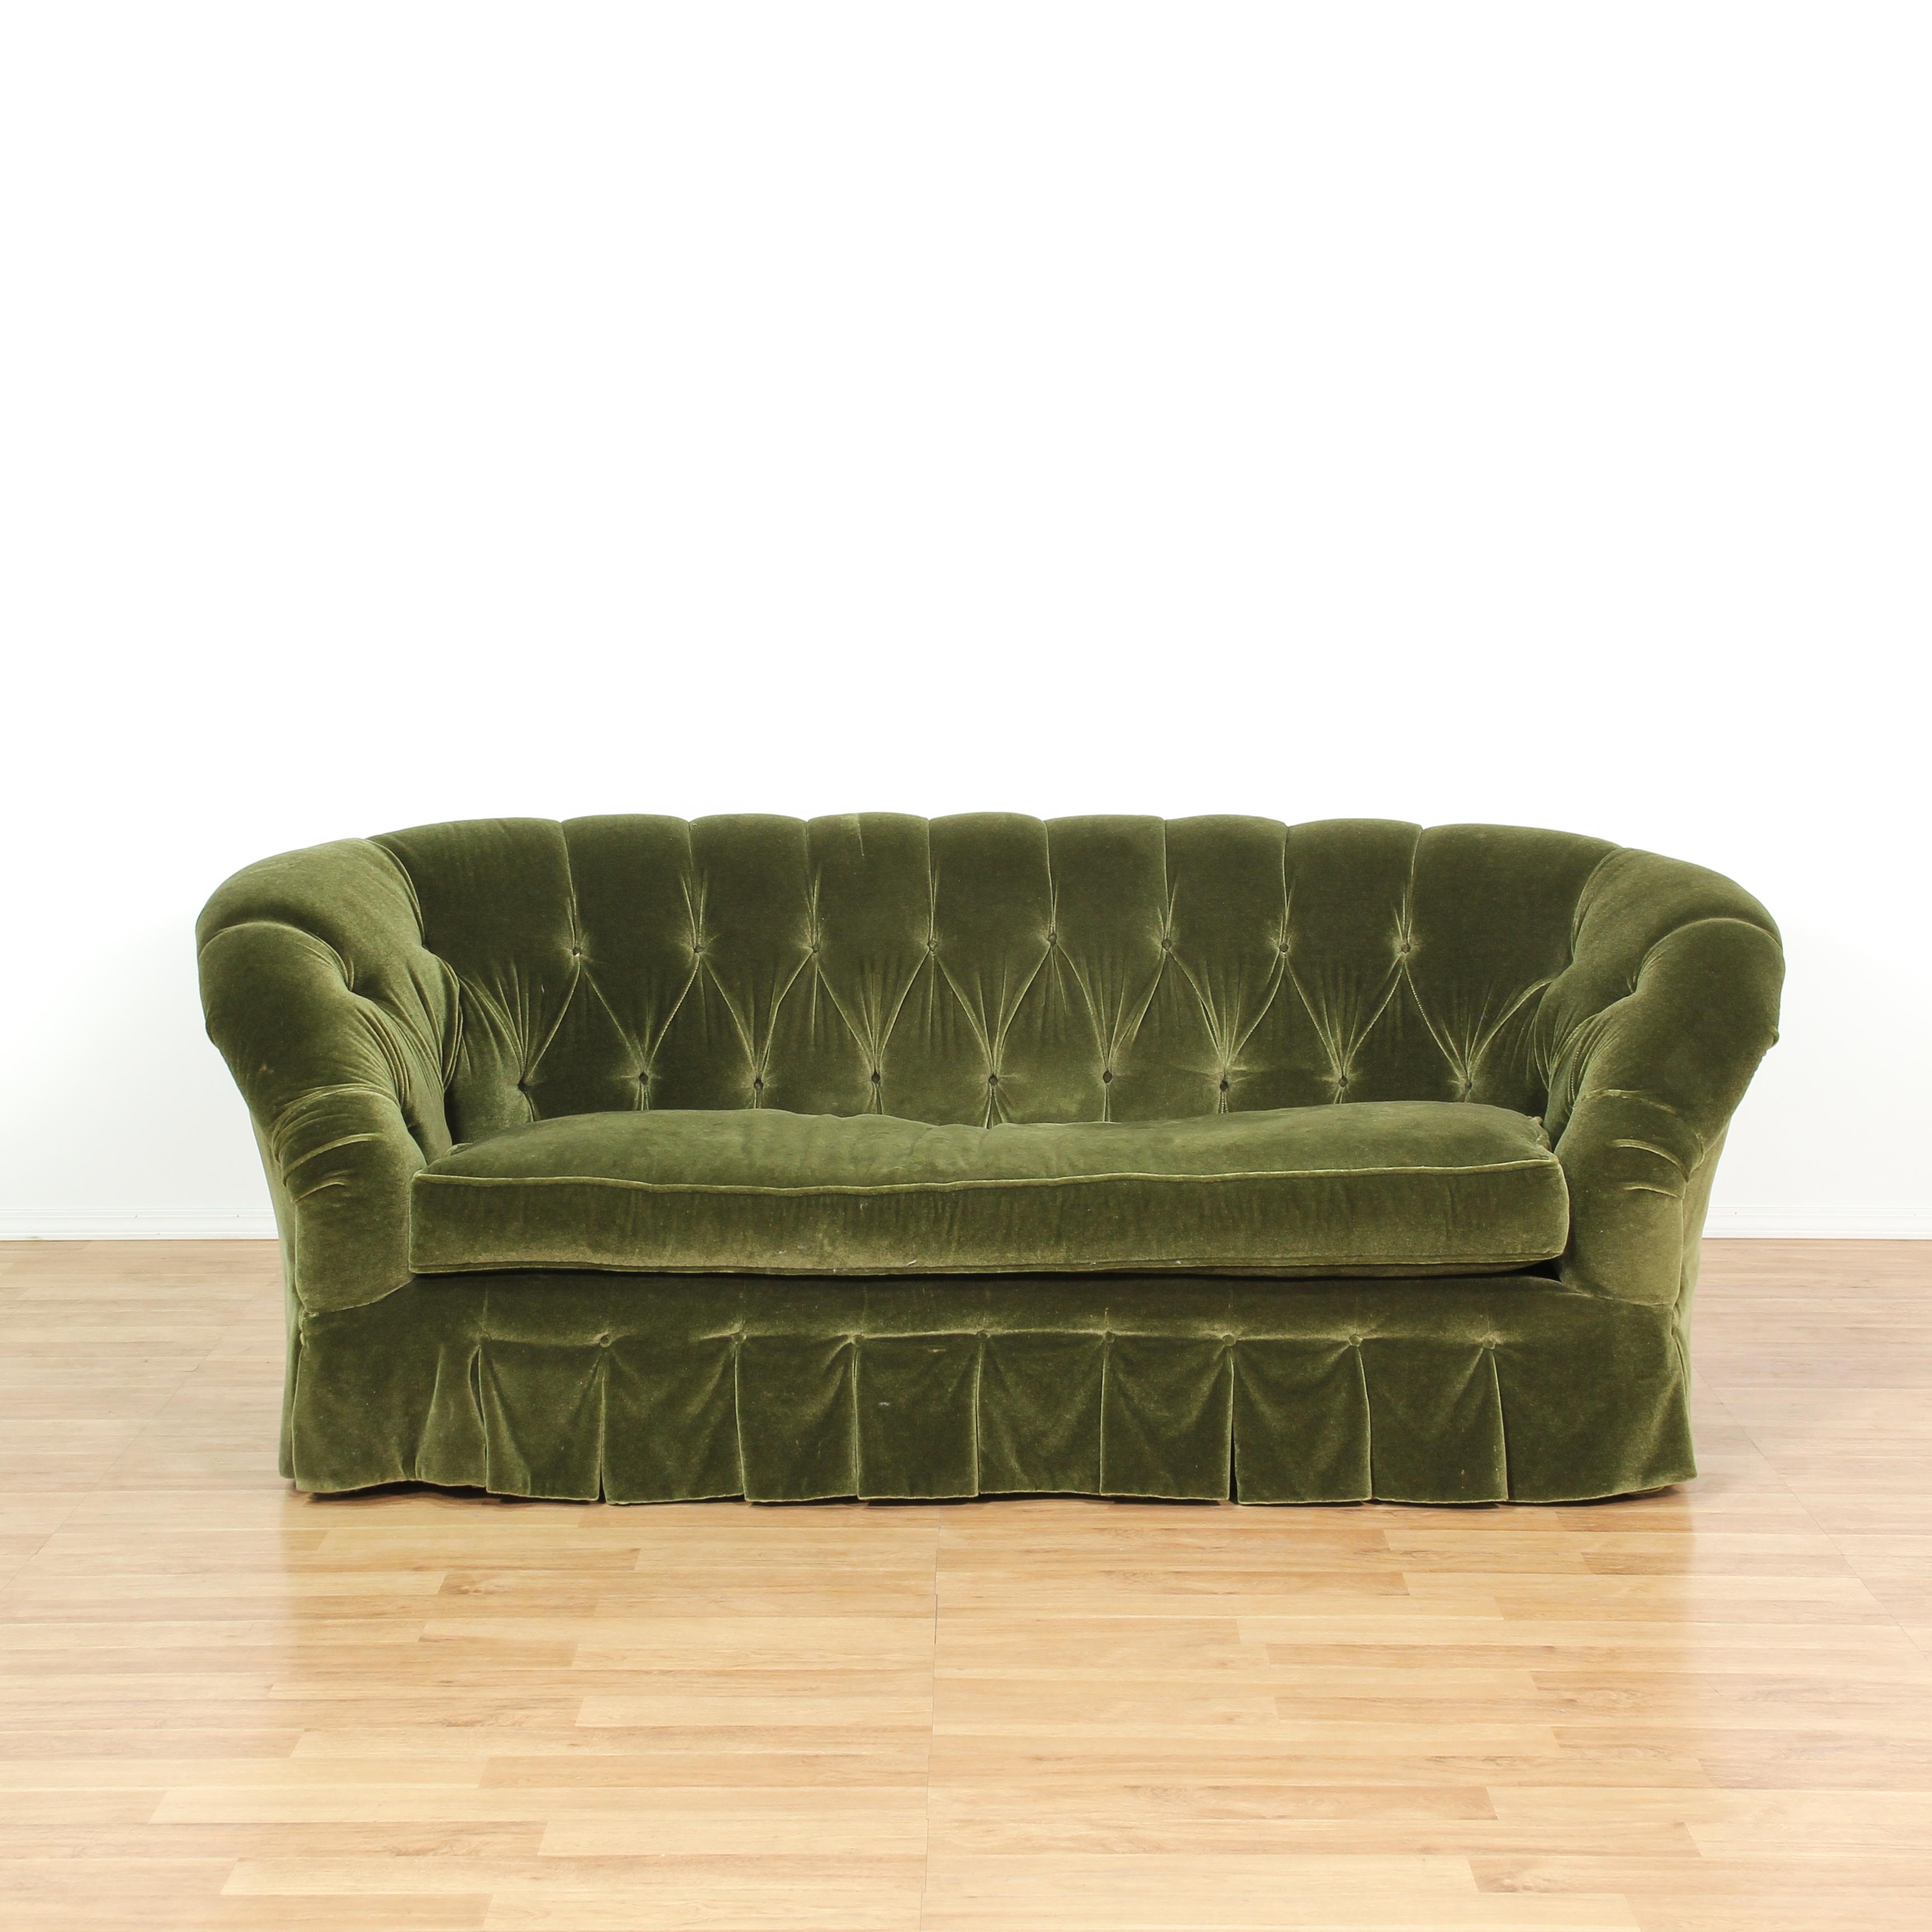 emerald green velvet sofa bed houston cut tufted loveseat vintage furniture